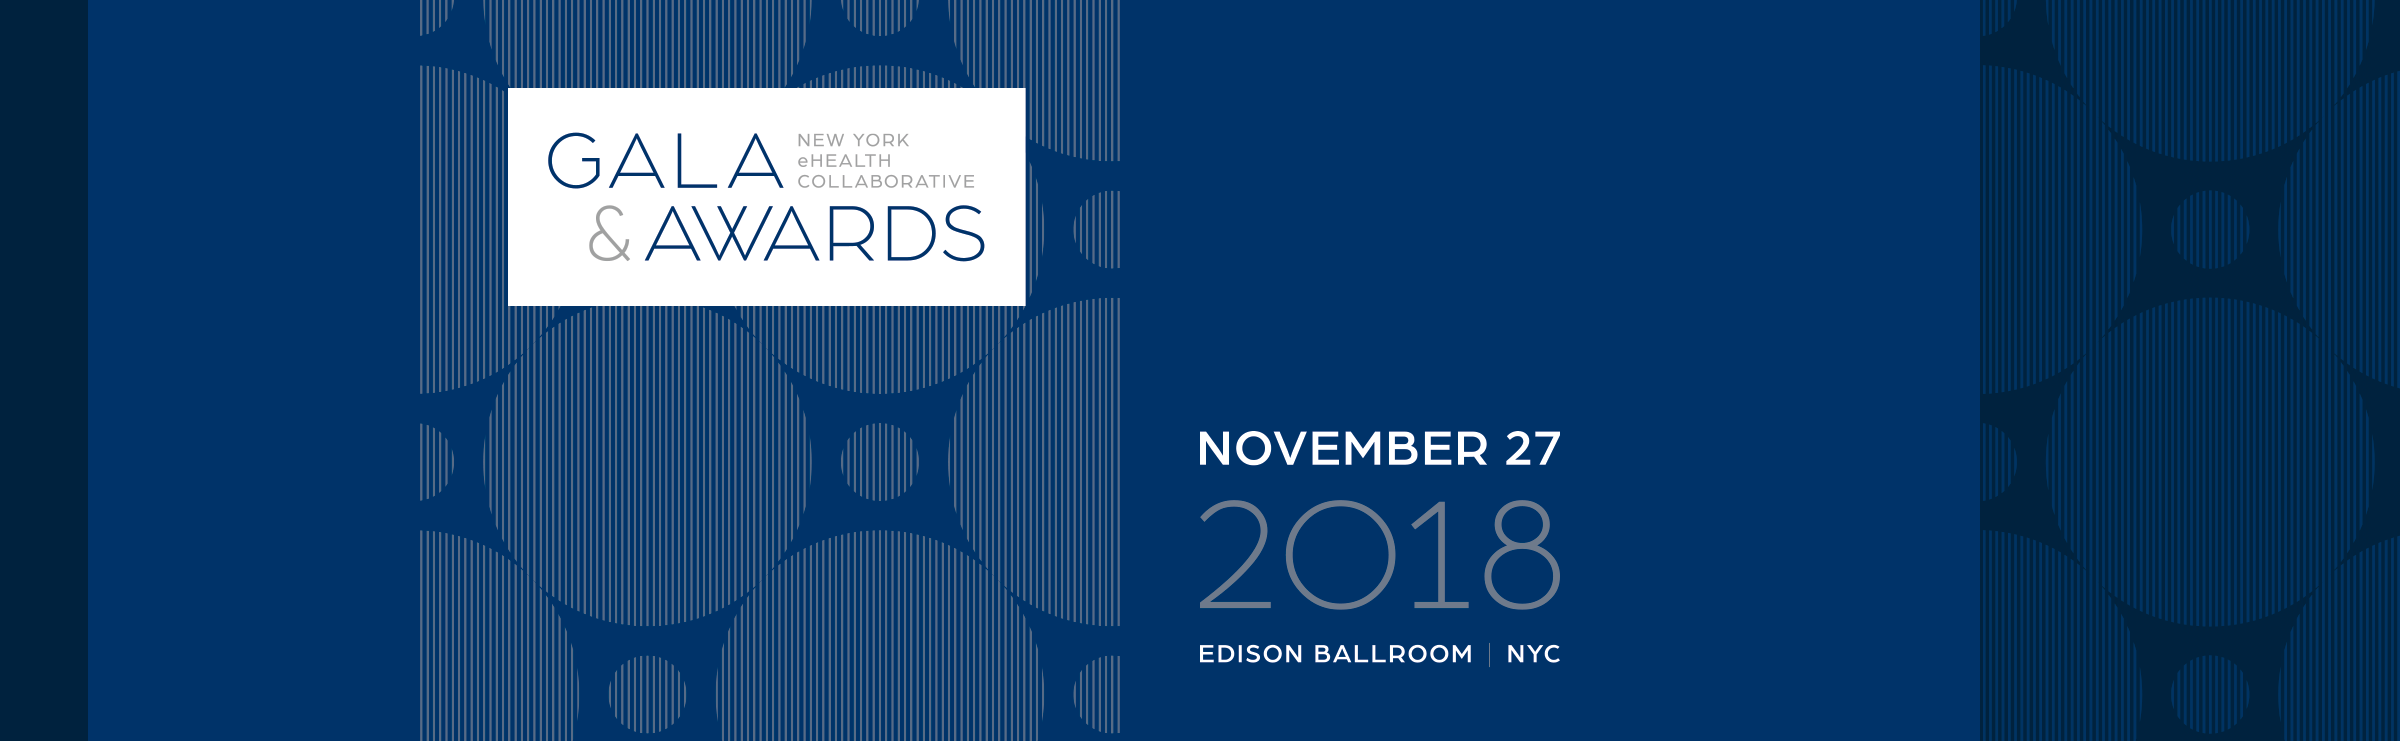 2018-Gala-Awards-Web-Slider